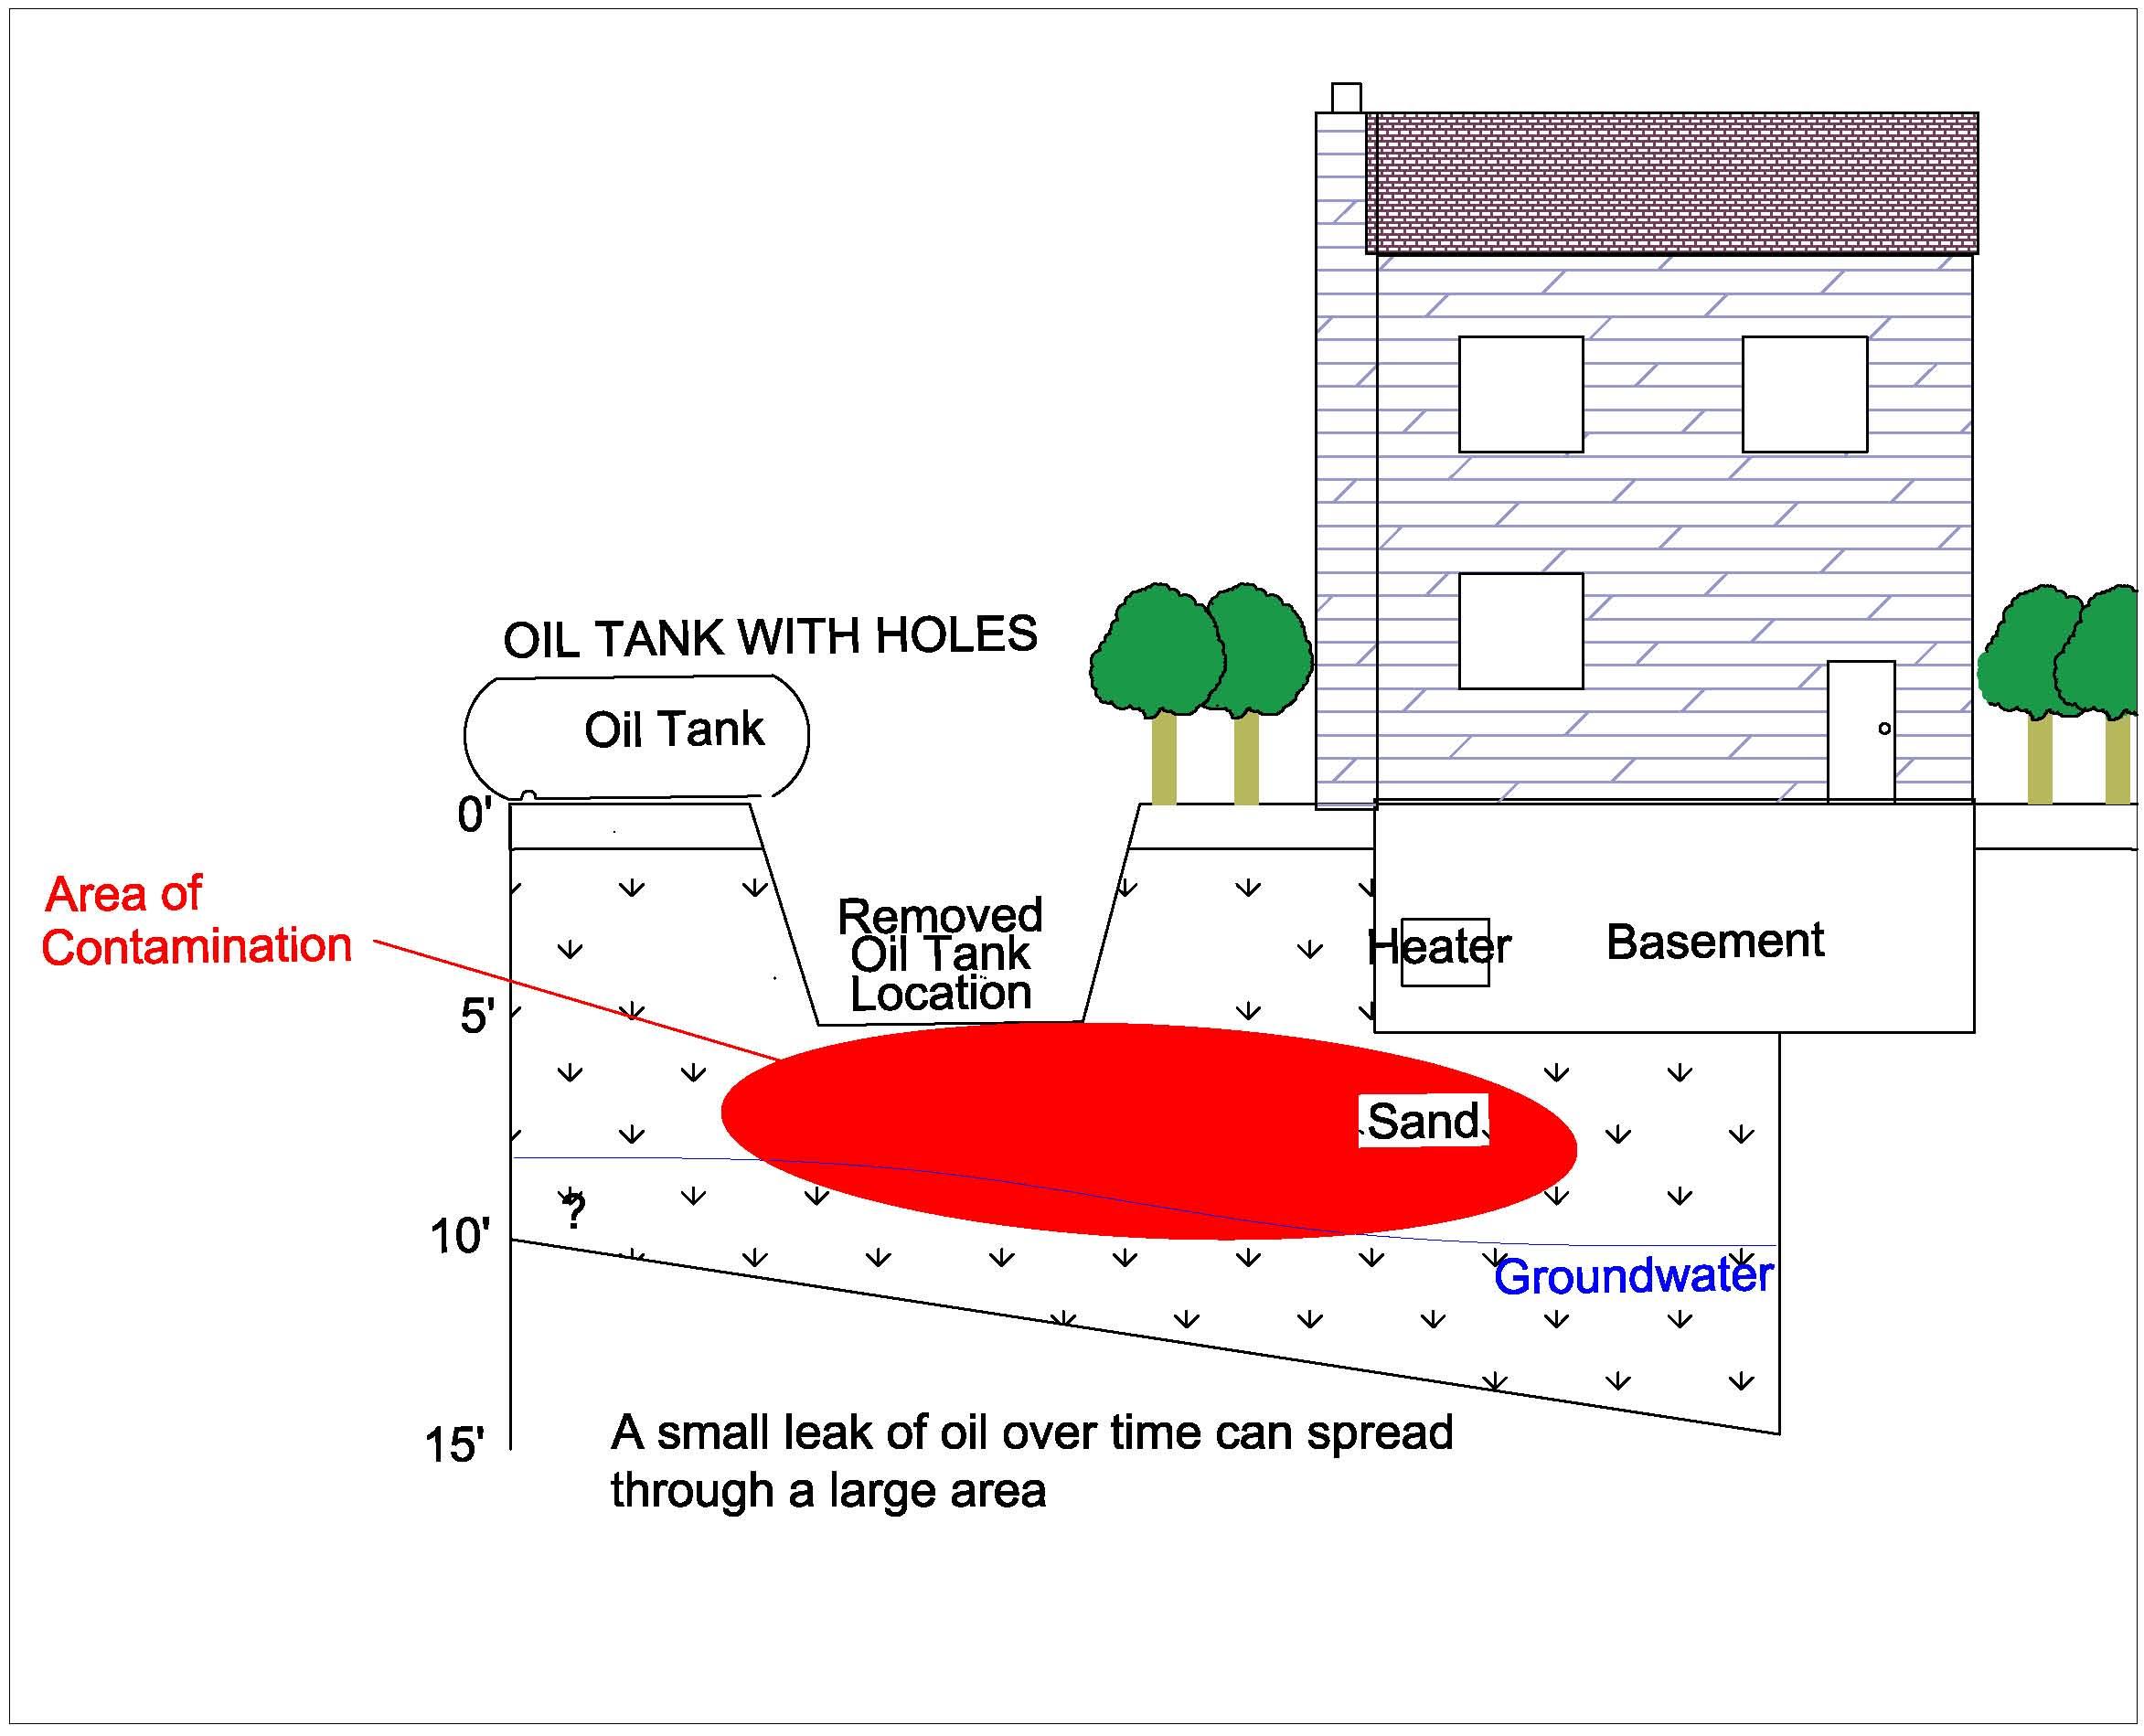 heating oil tank contamination plume